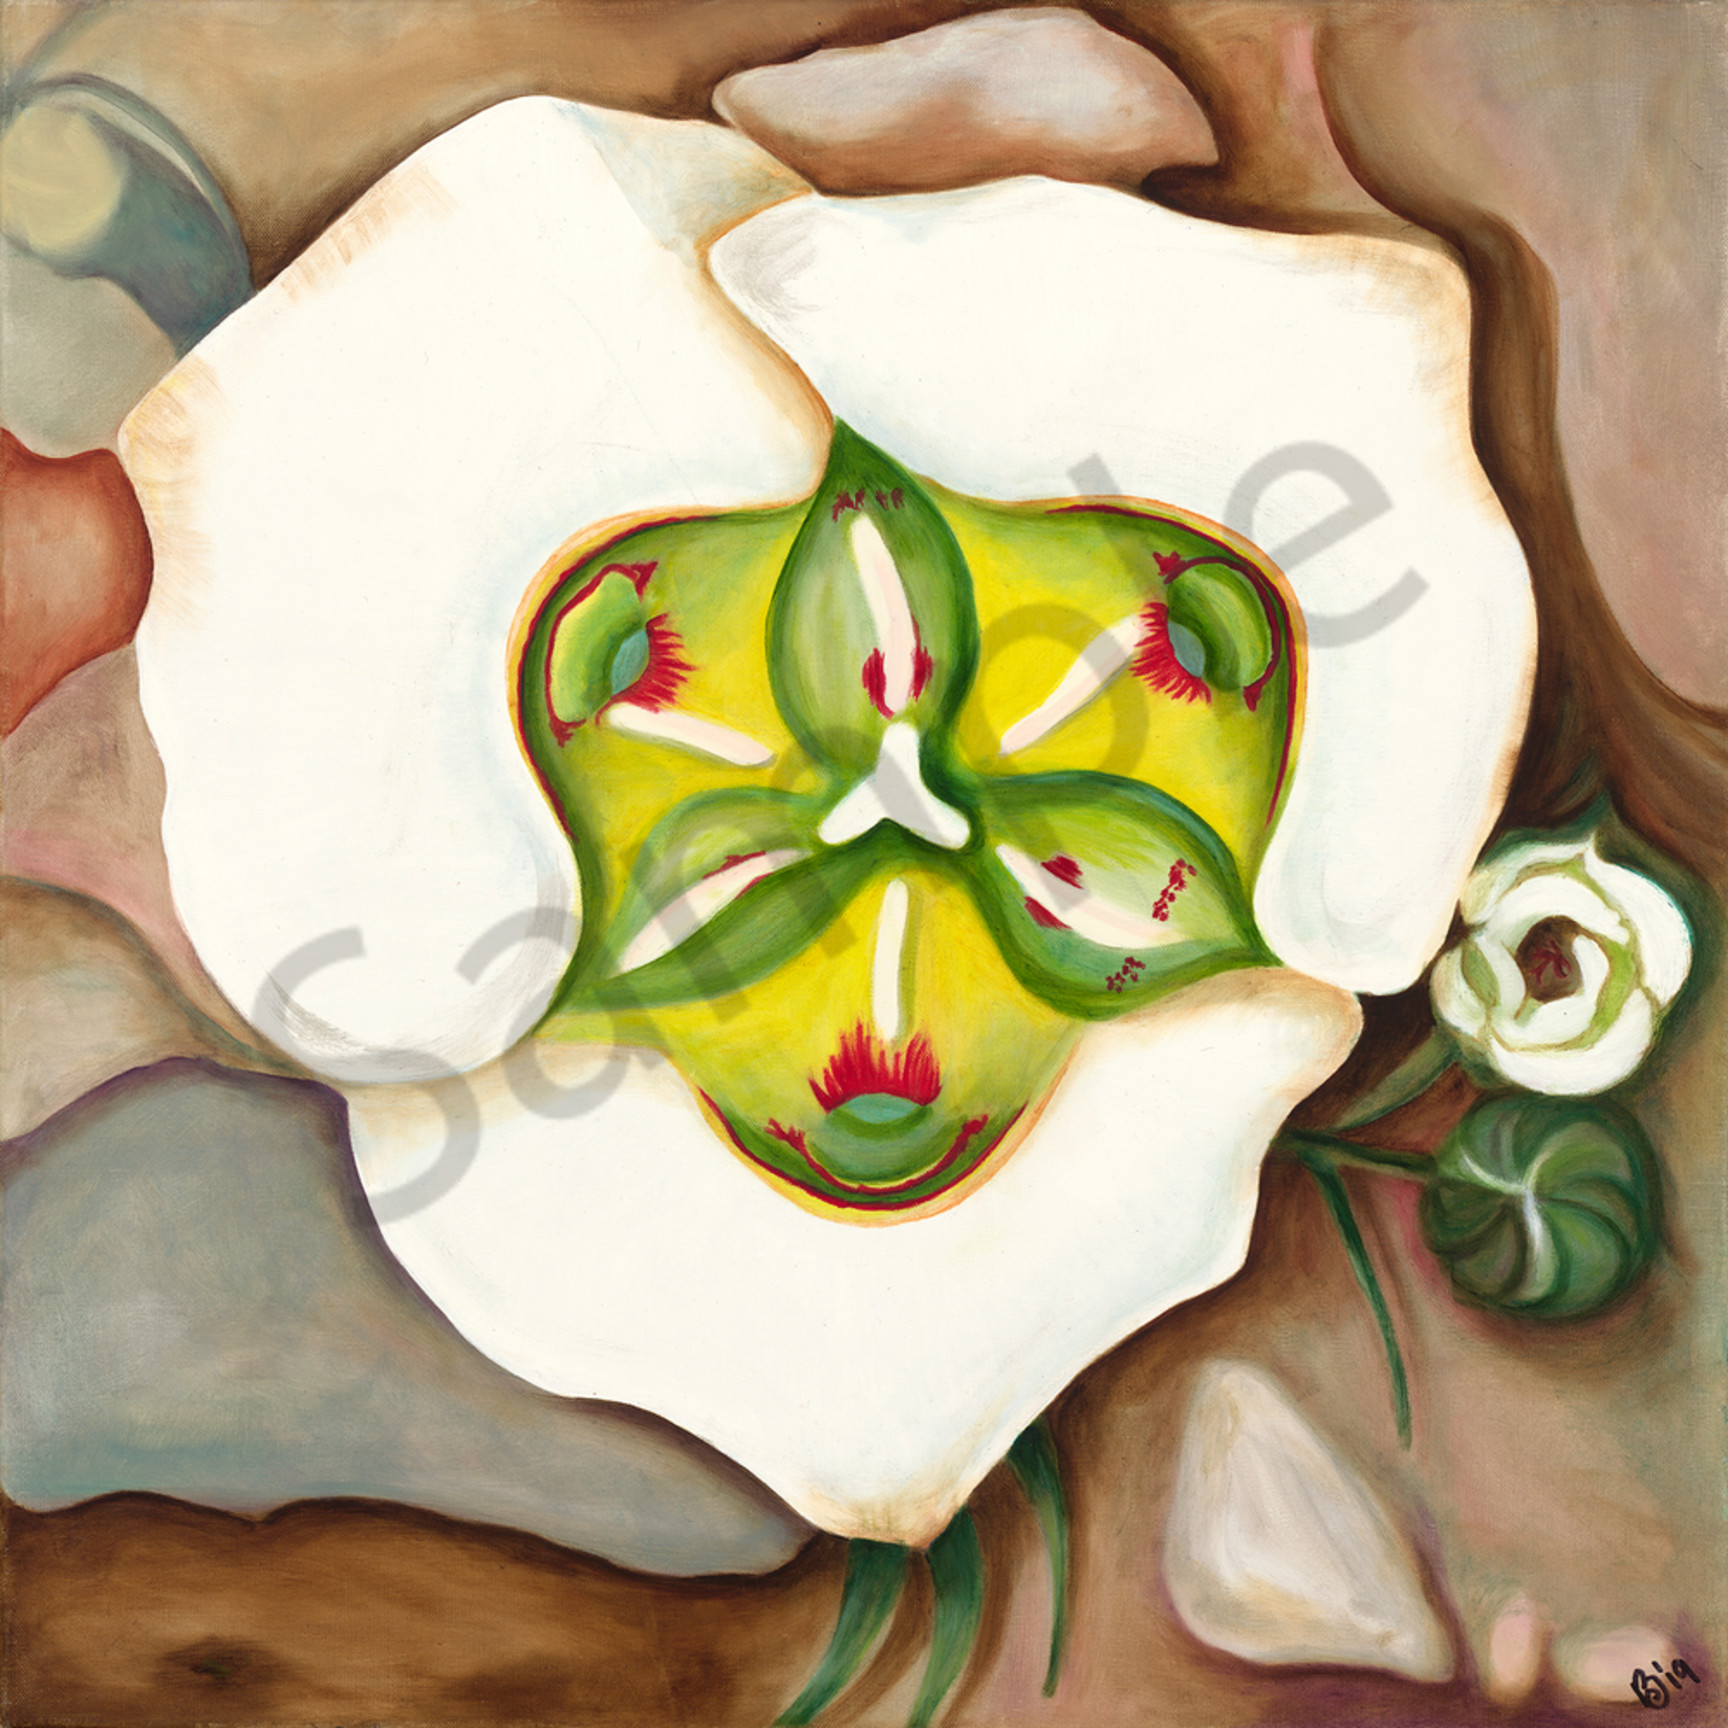 Moggre sego lily i square aysr5y